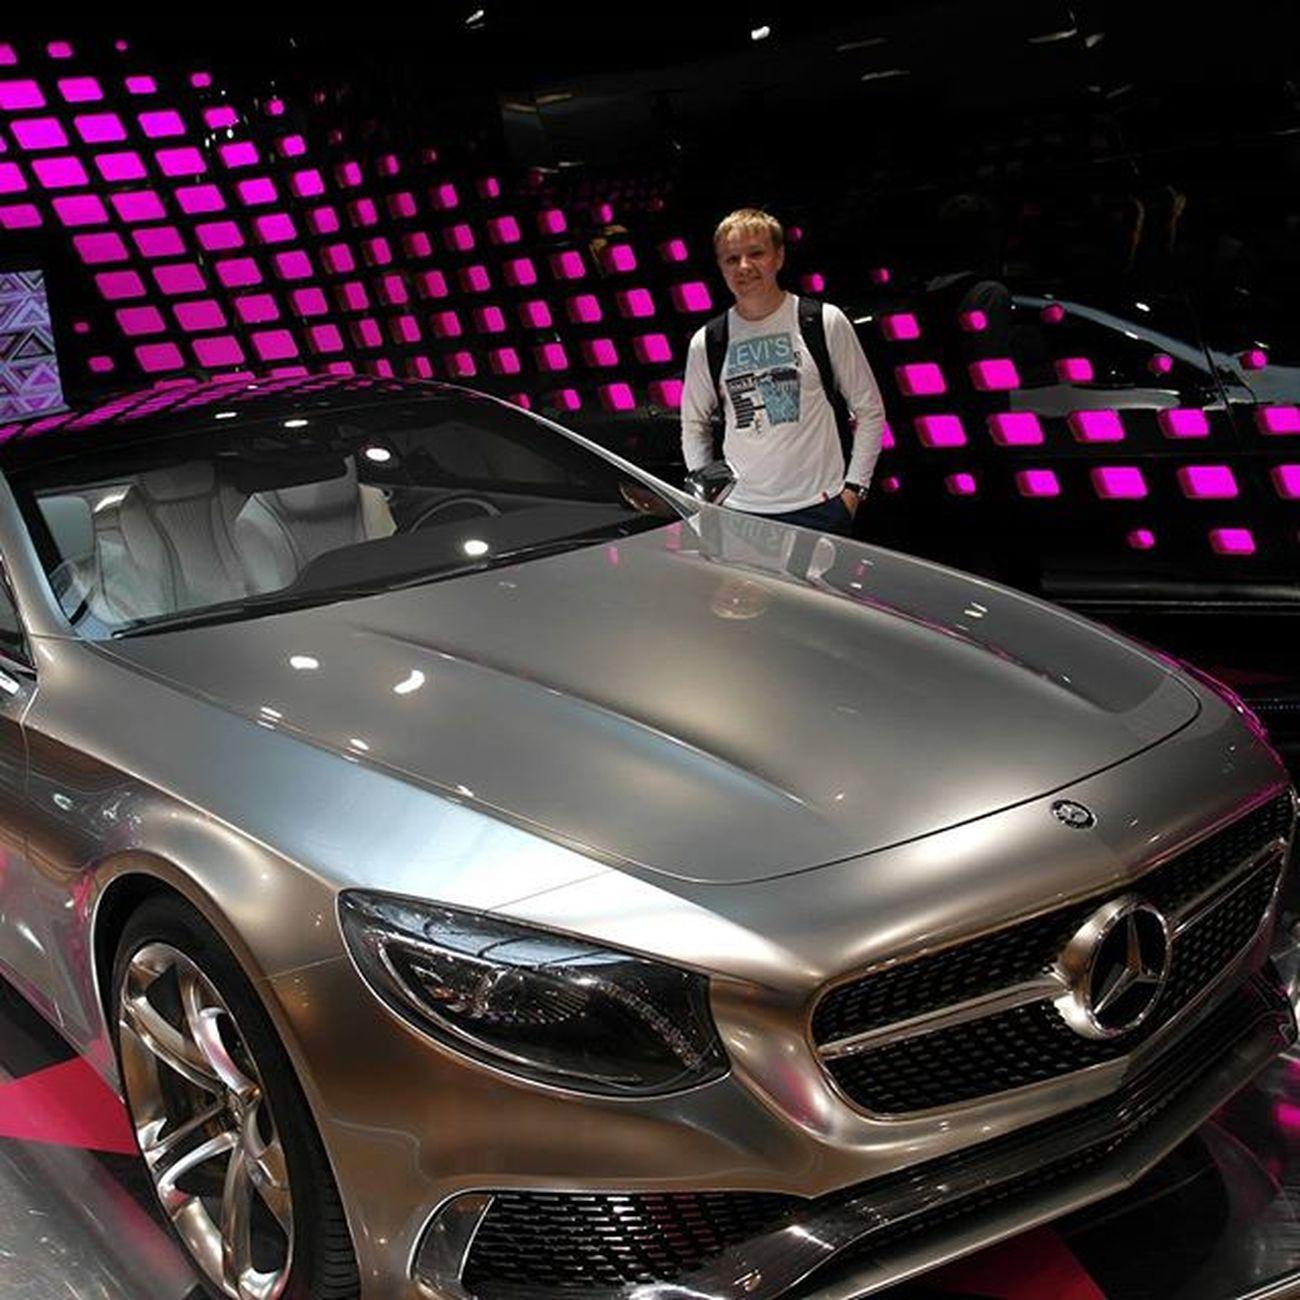 Мой будующий автомобиль) Paris Mercedes Champs Elyzee.. Travel Paris Champselysées Mercedes Awesome